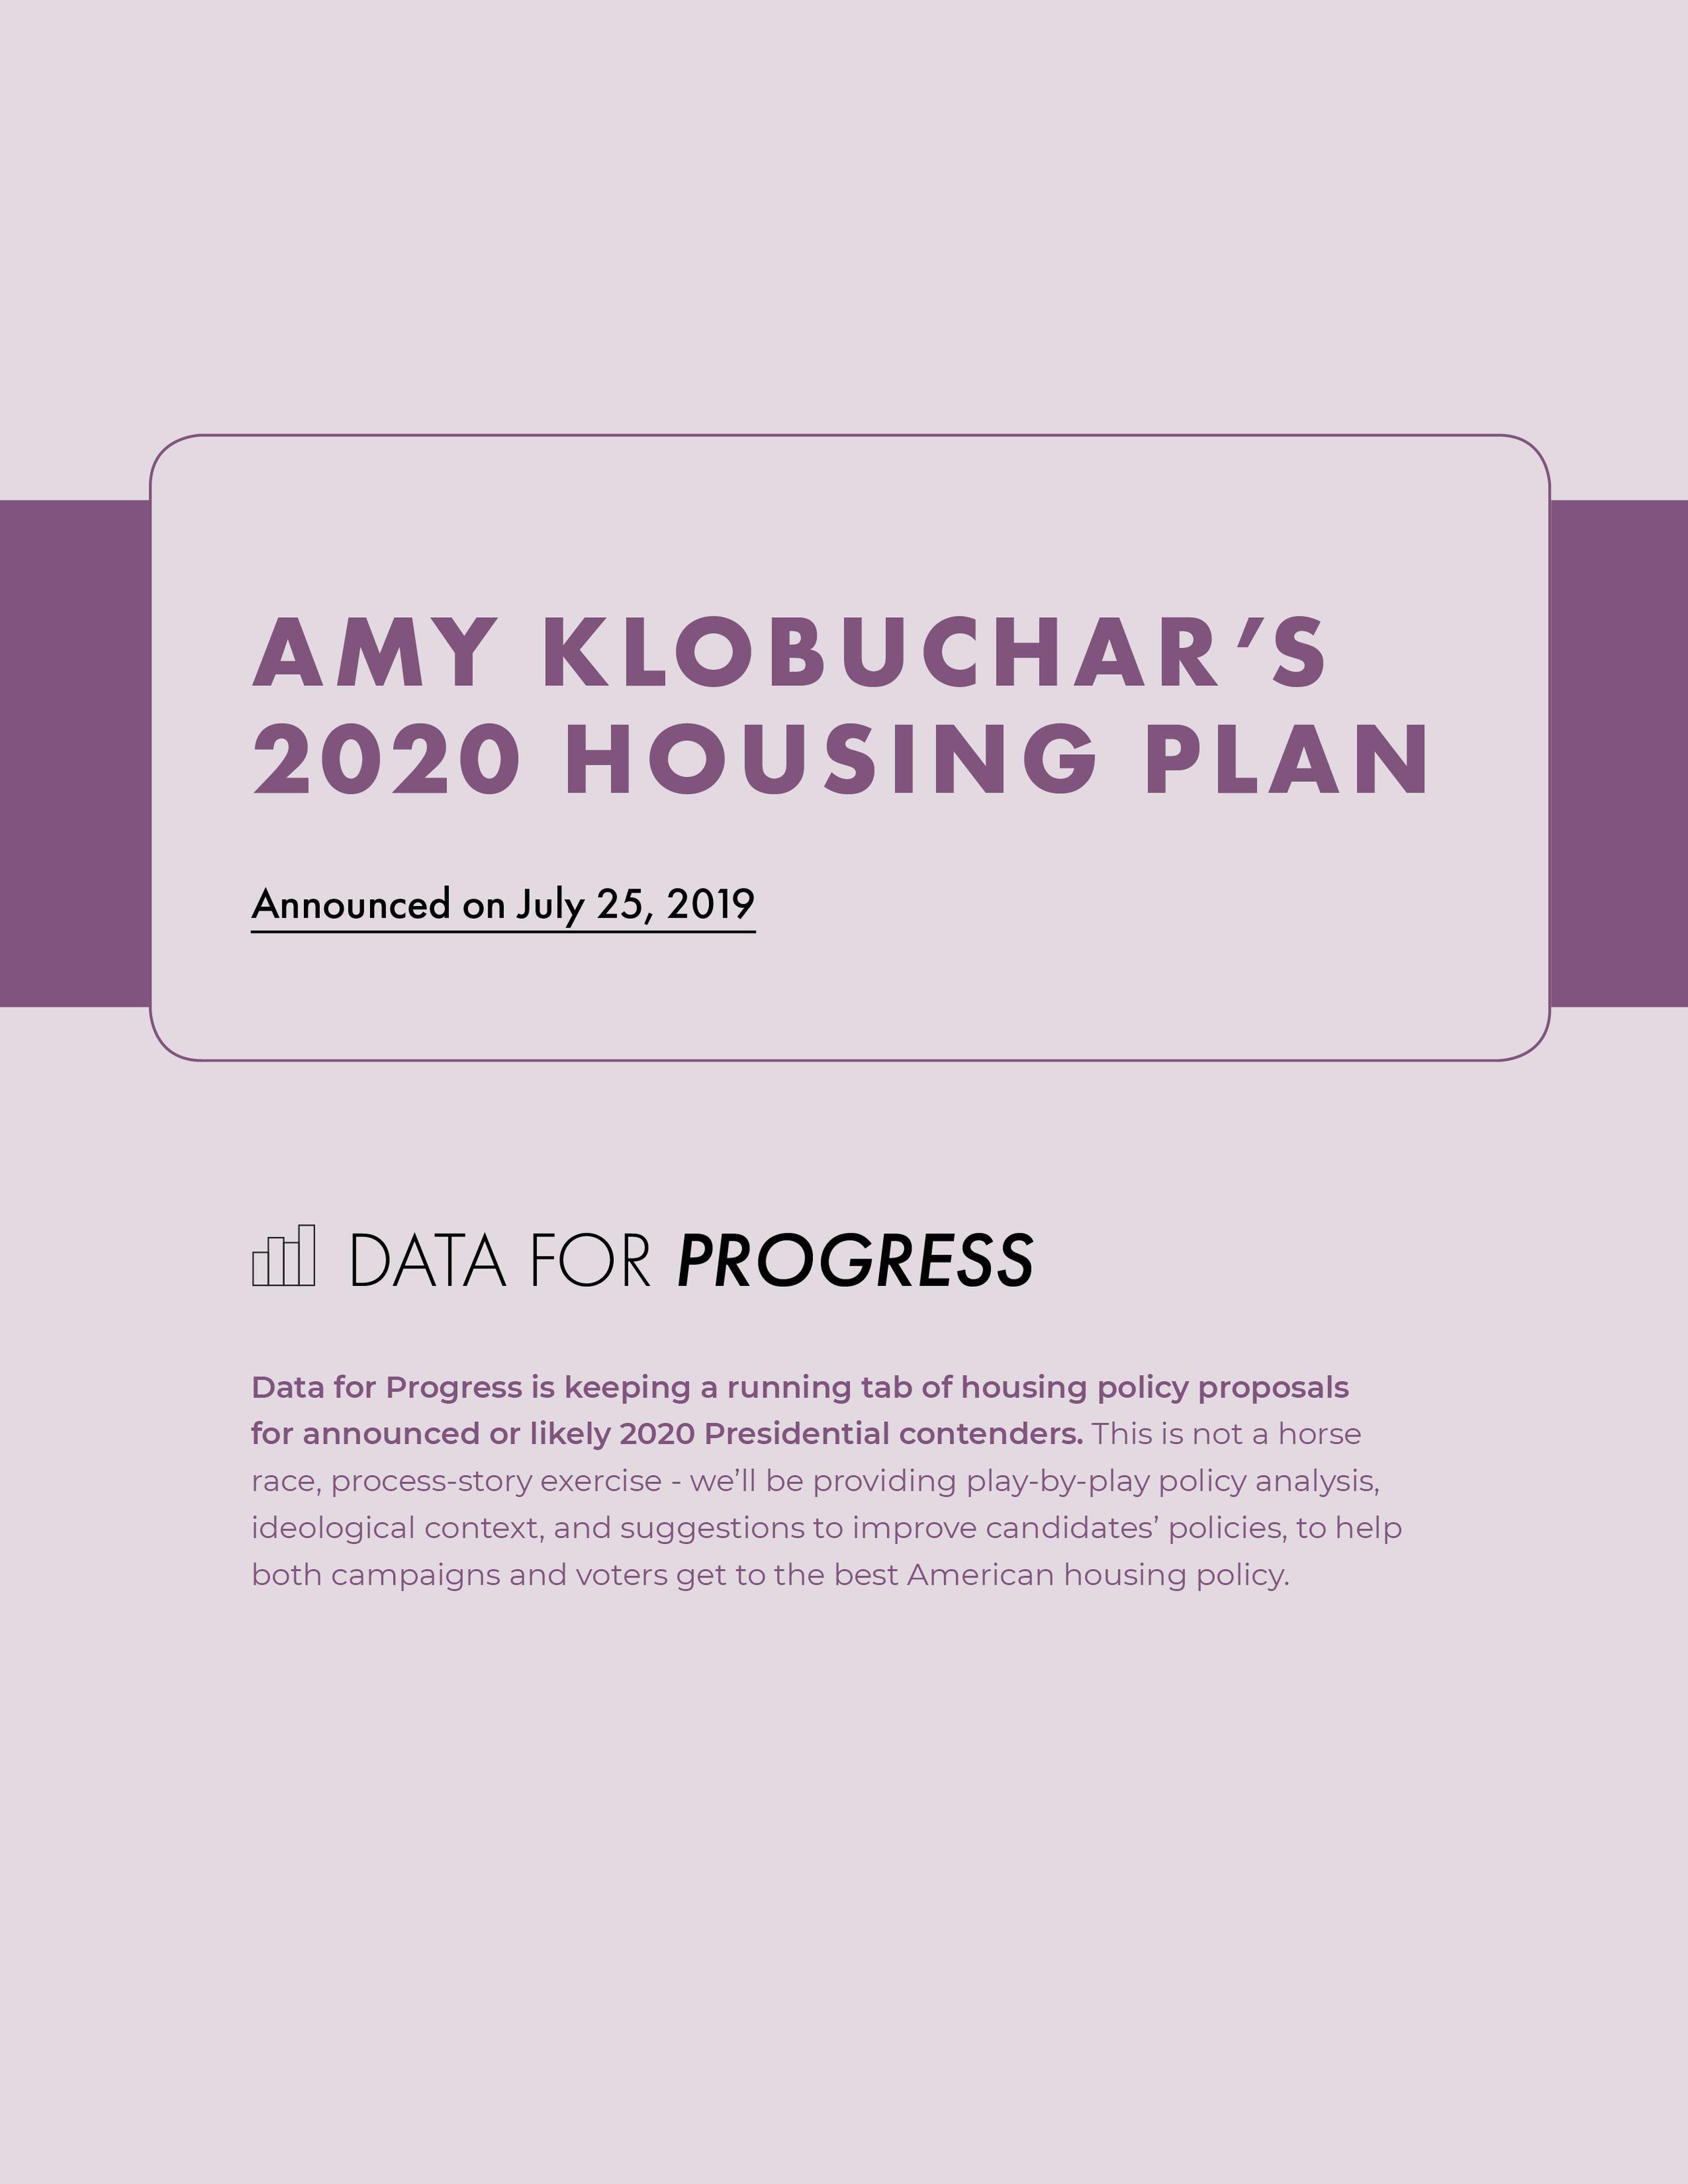 DFP_Housing_Klobuchar_COVER.png